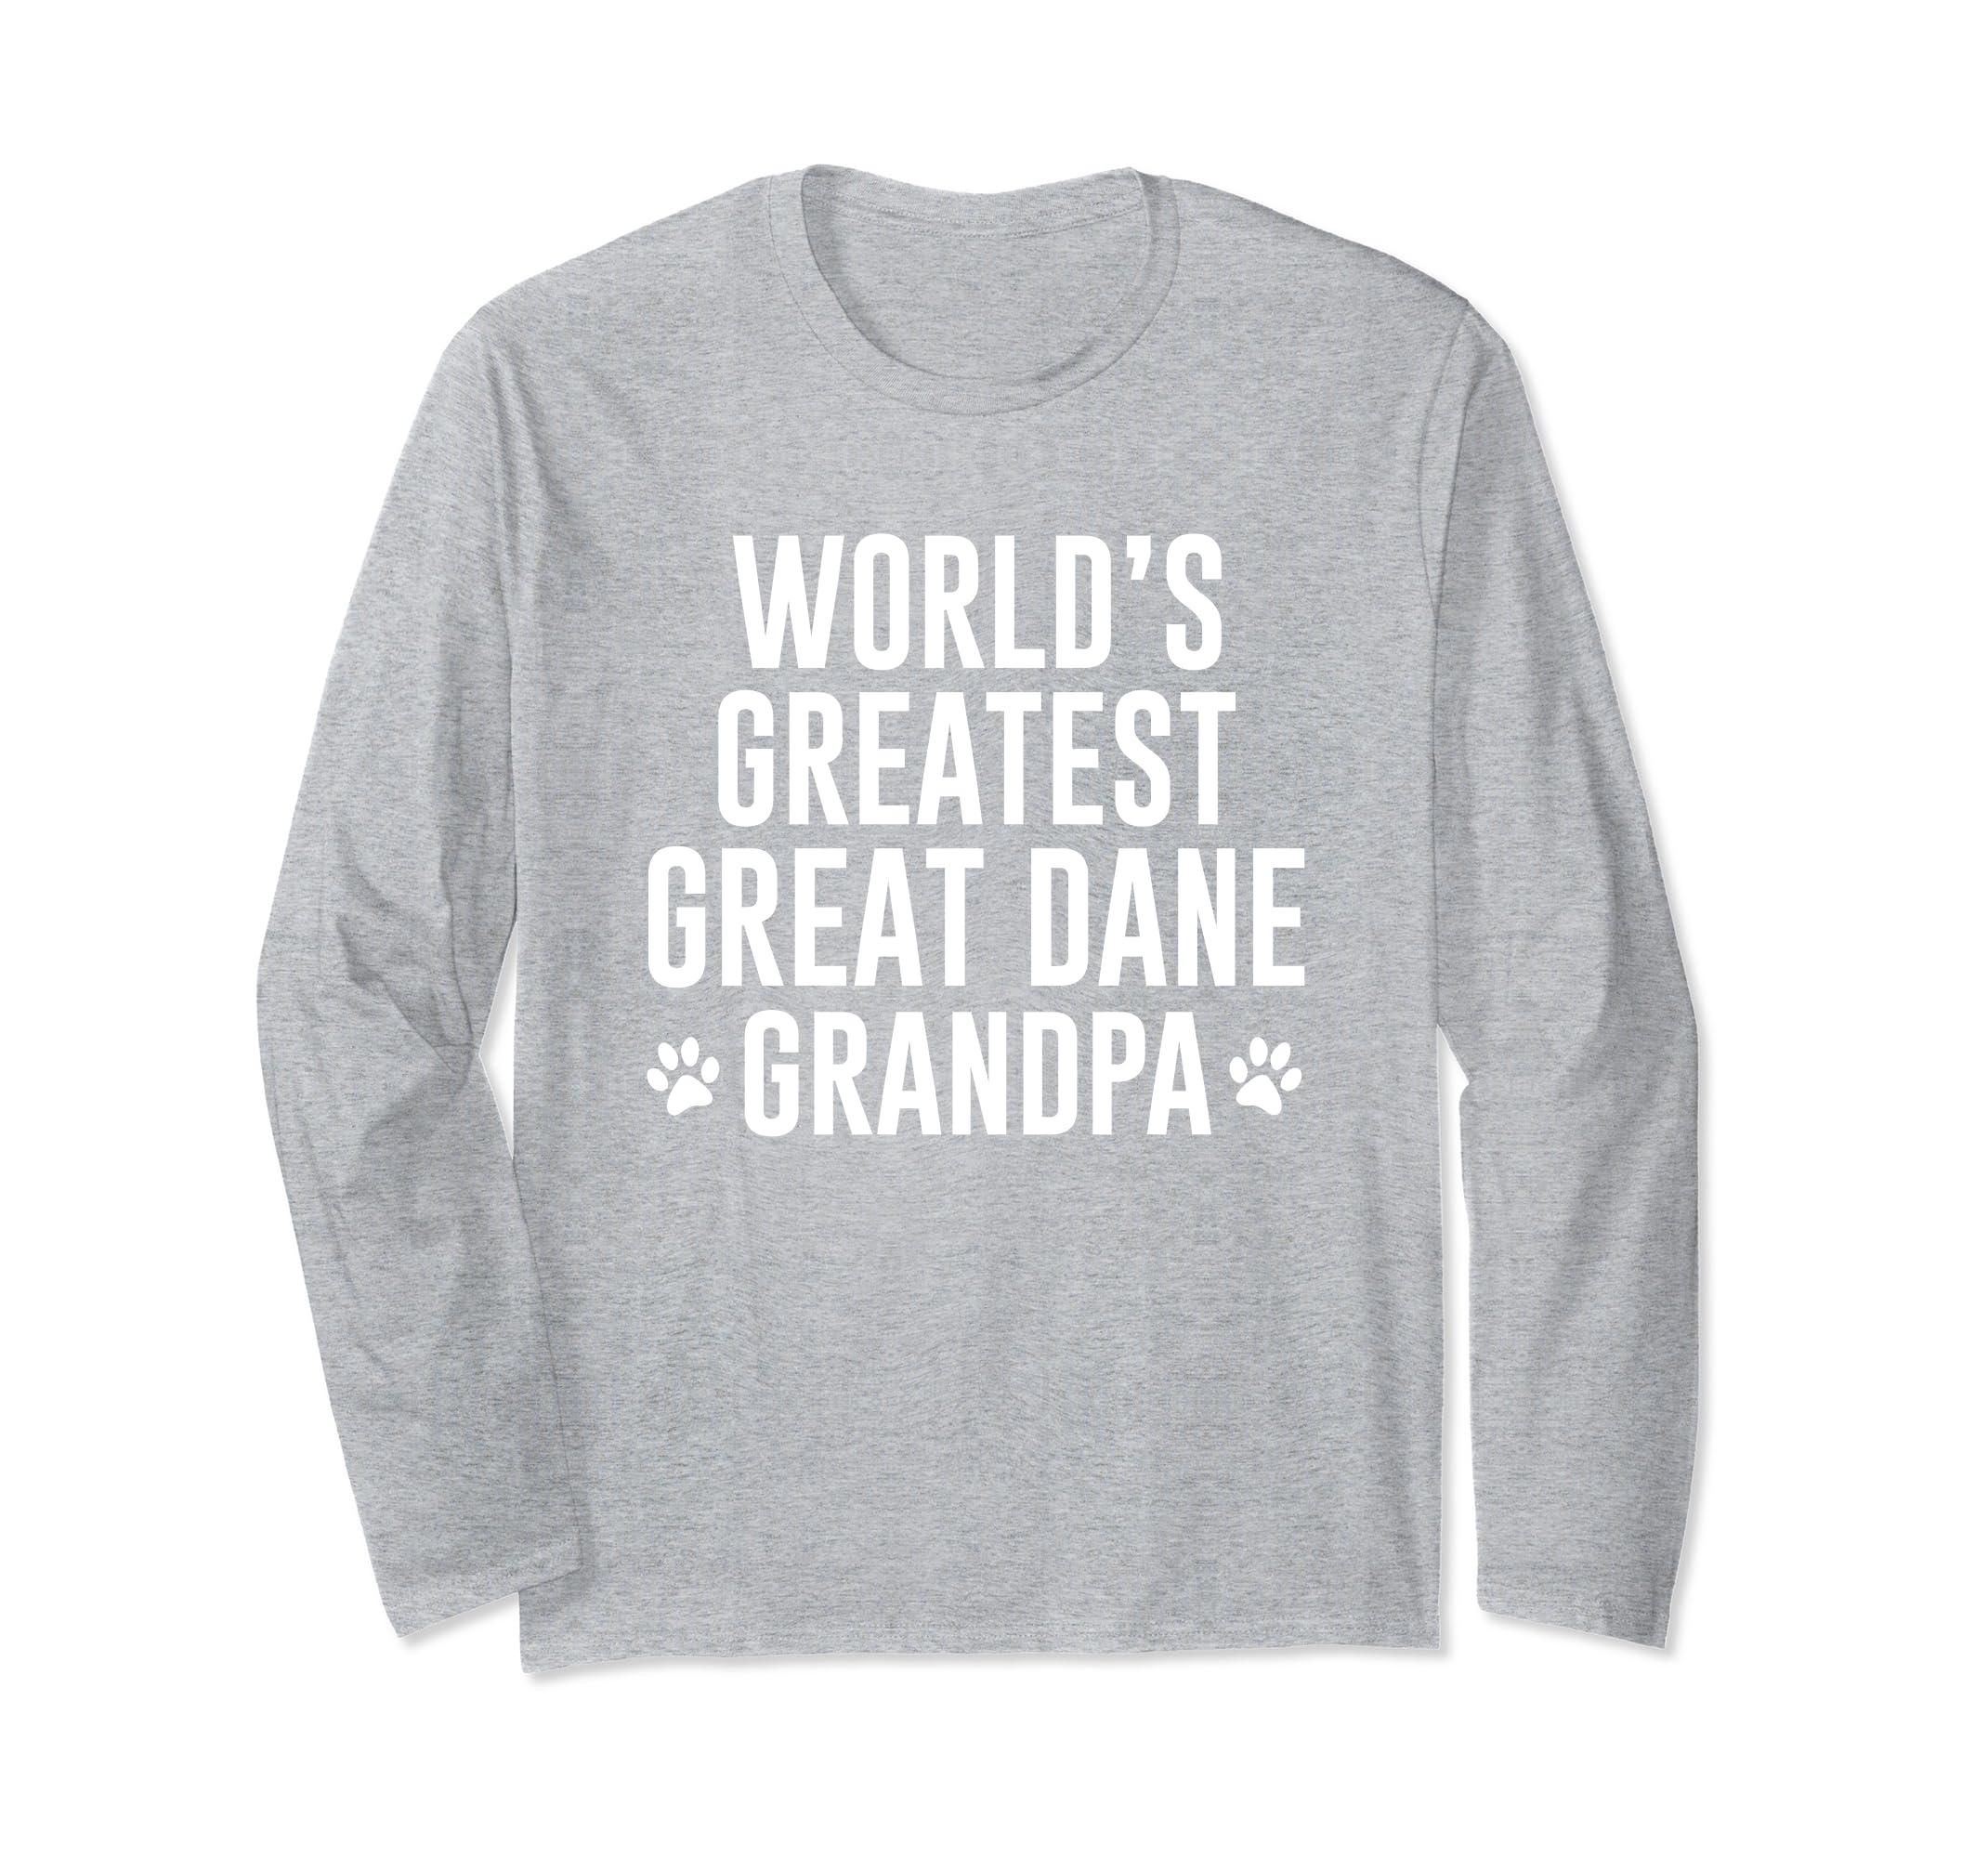 WORLDS GREATEST GREAT DANE GRANDPA LONG SLEEVE SHIRT-SFL